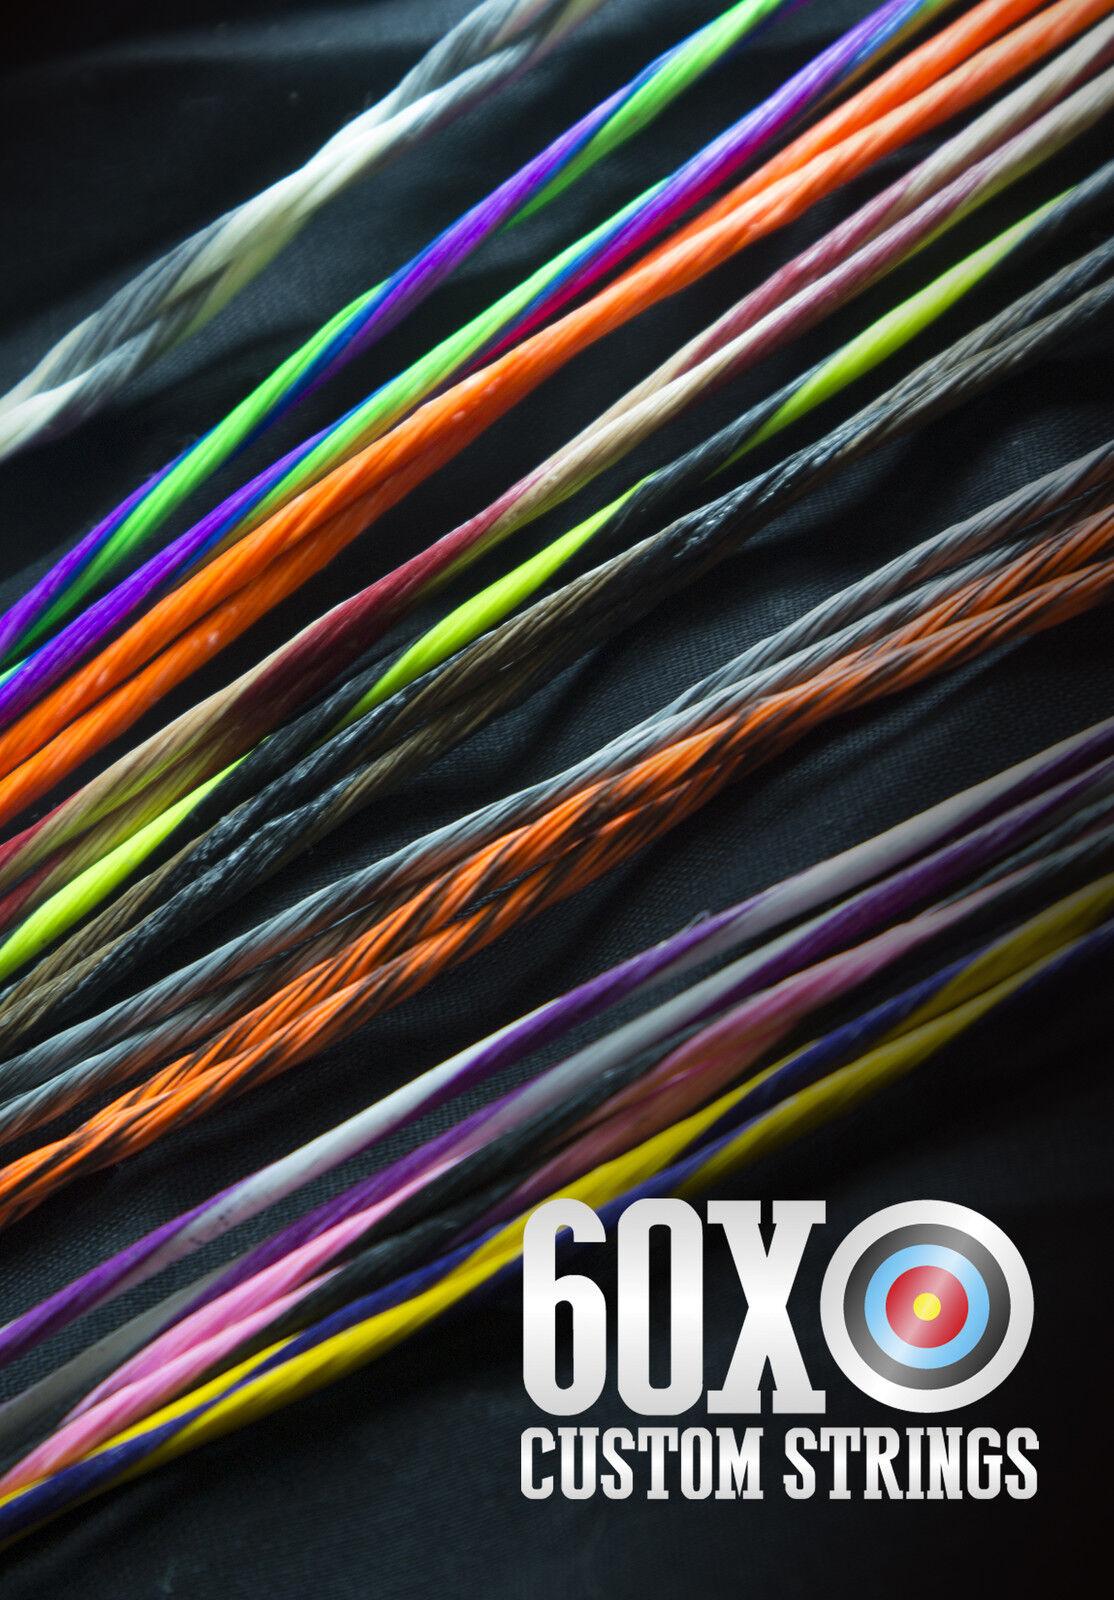 "Excalibur Matrix Crossbow String 31"" by 60X Custom Strings B"